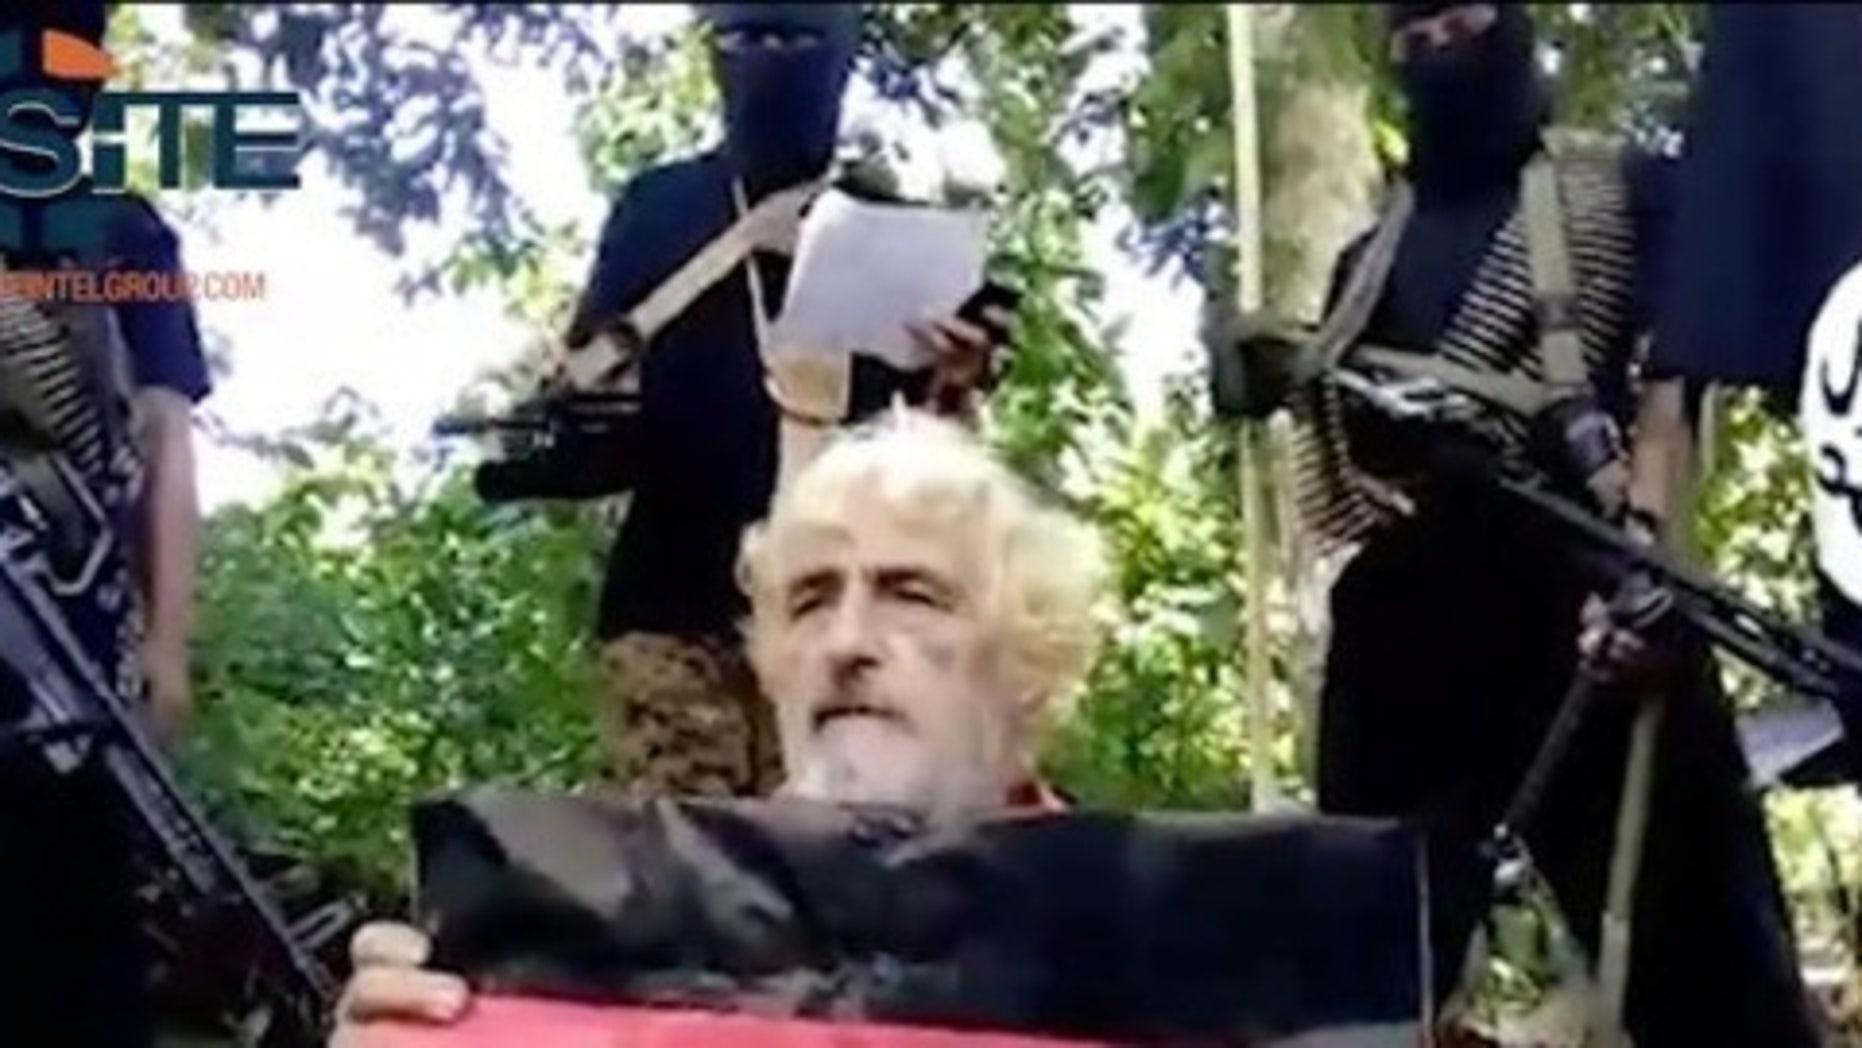 German hostage Jurgen Gustav Kantner kneels before his Islamic militant captors at an undisclosed location.